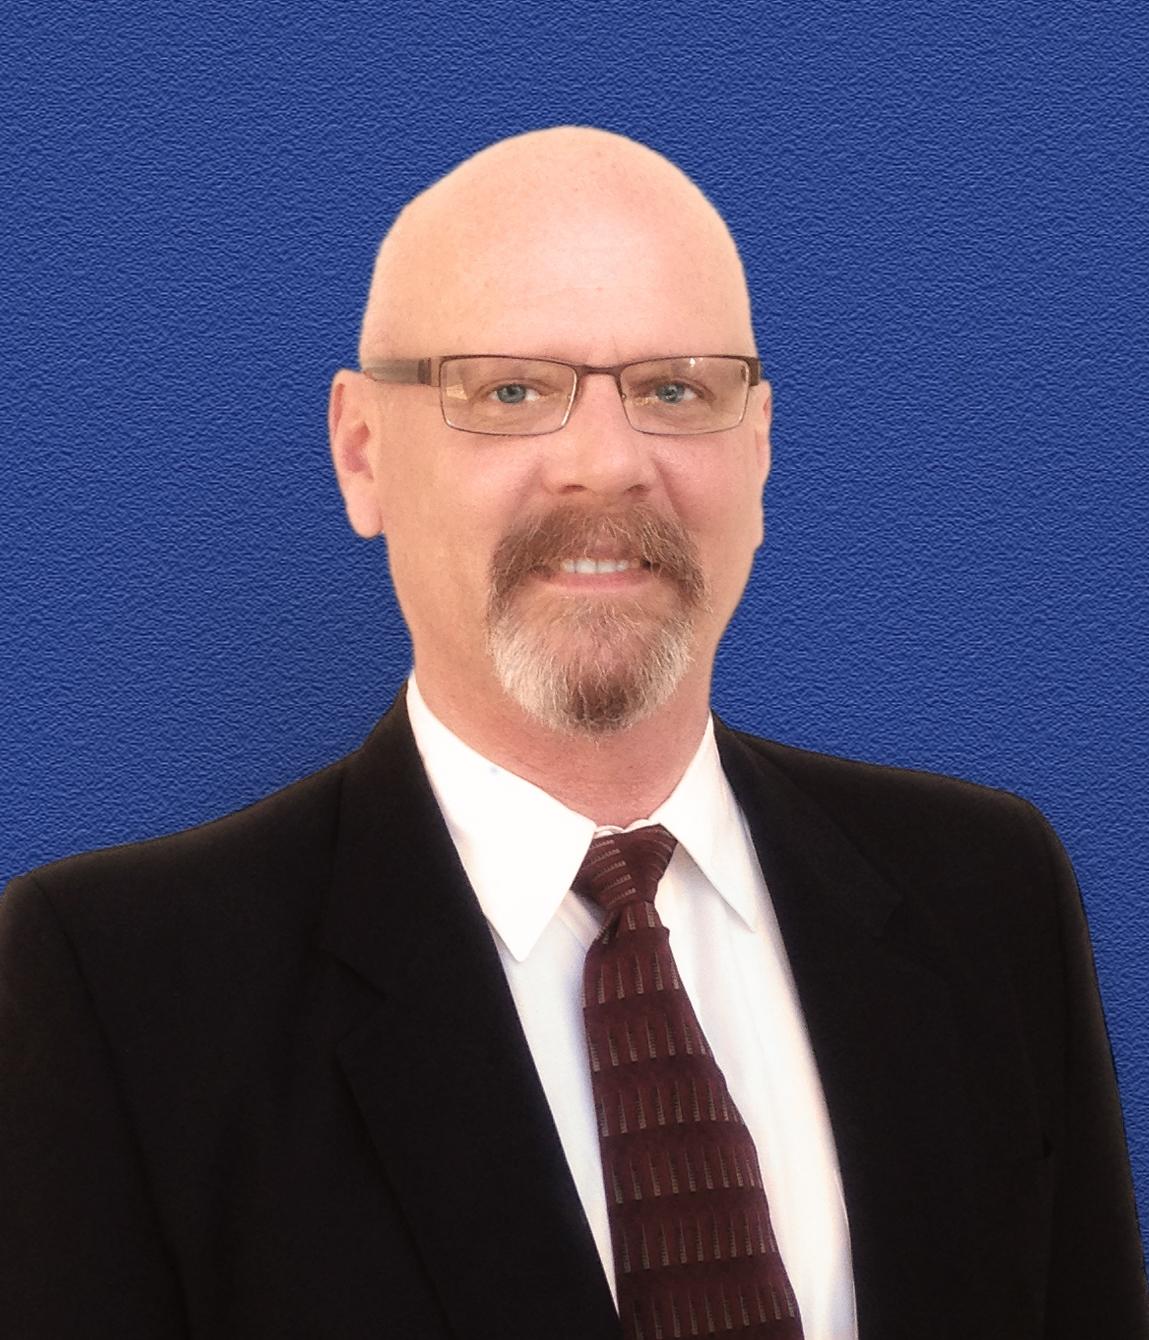 Craig Straube - Farmers Insurance Agent in Lakeway, TX